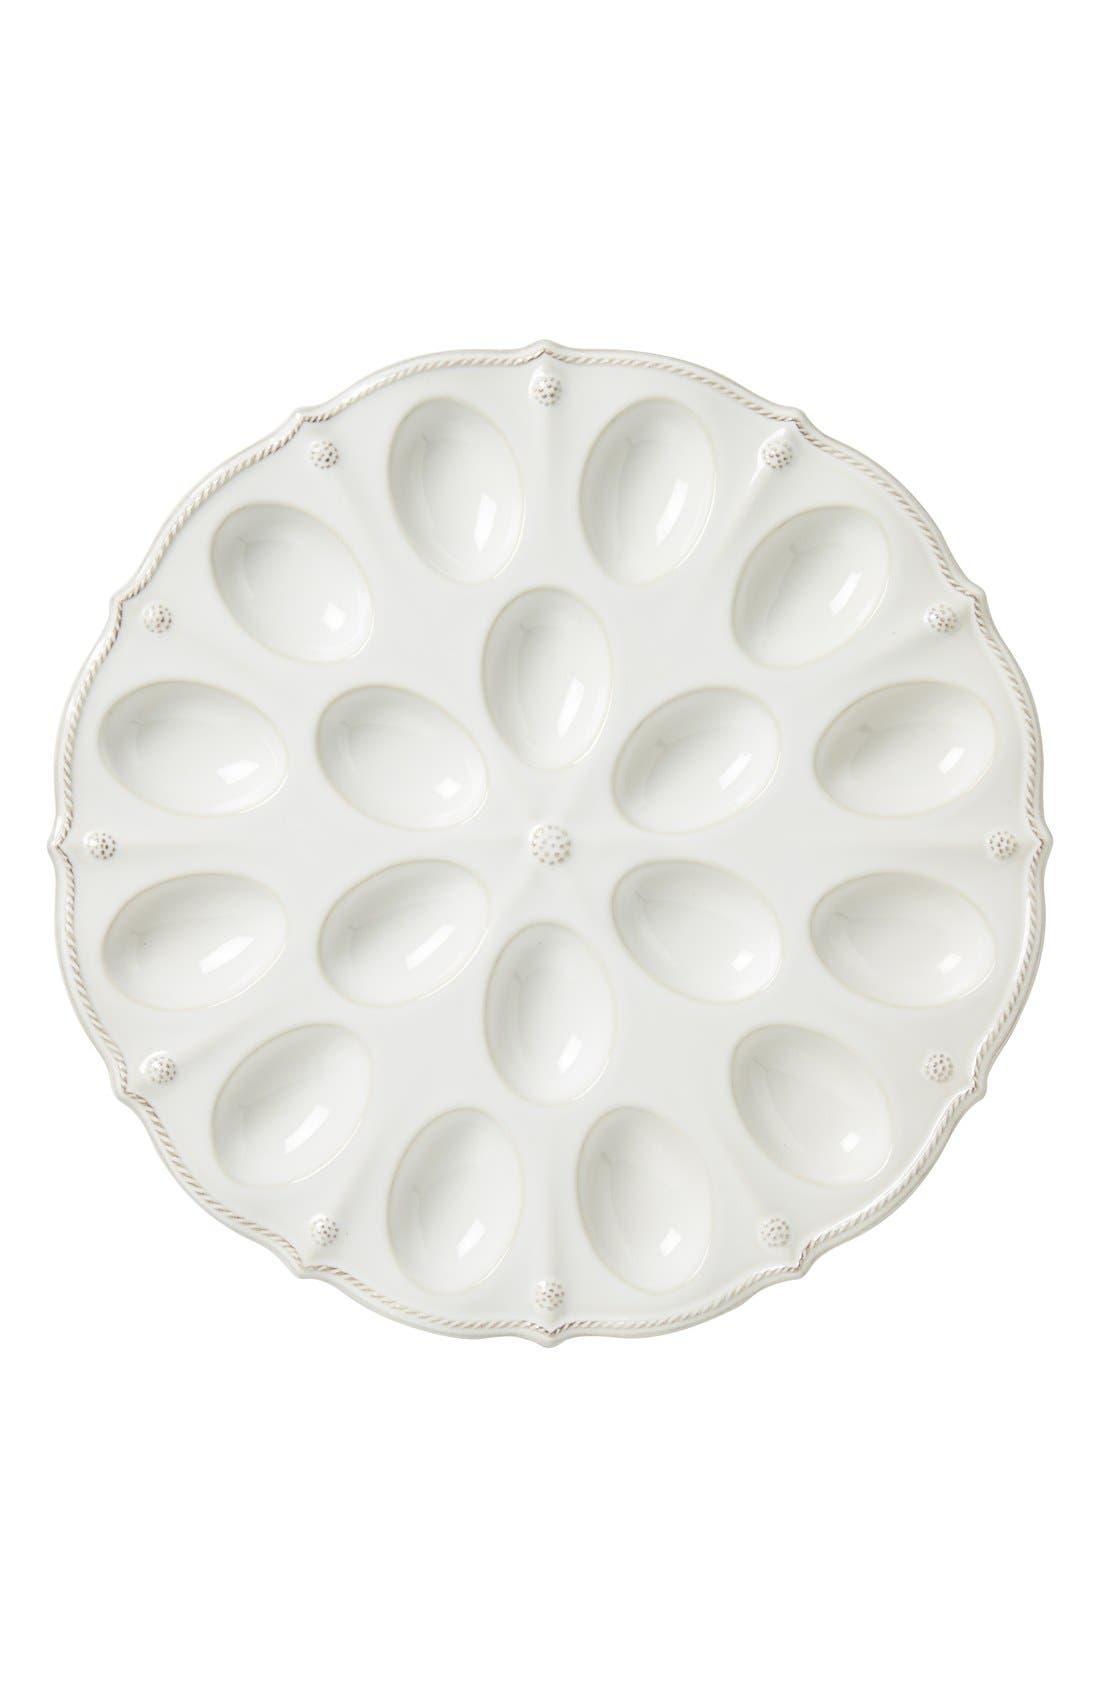 'Berry and Thread' Egg Platter,                             Alternate thumbnail 2, color,                             WHITEWASH